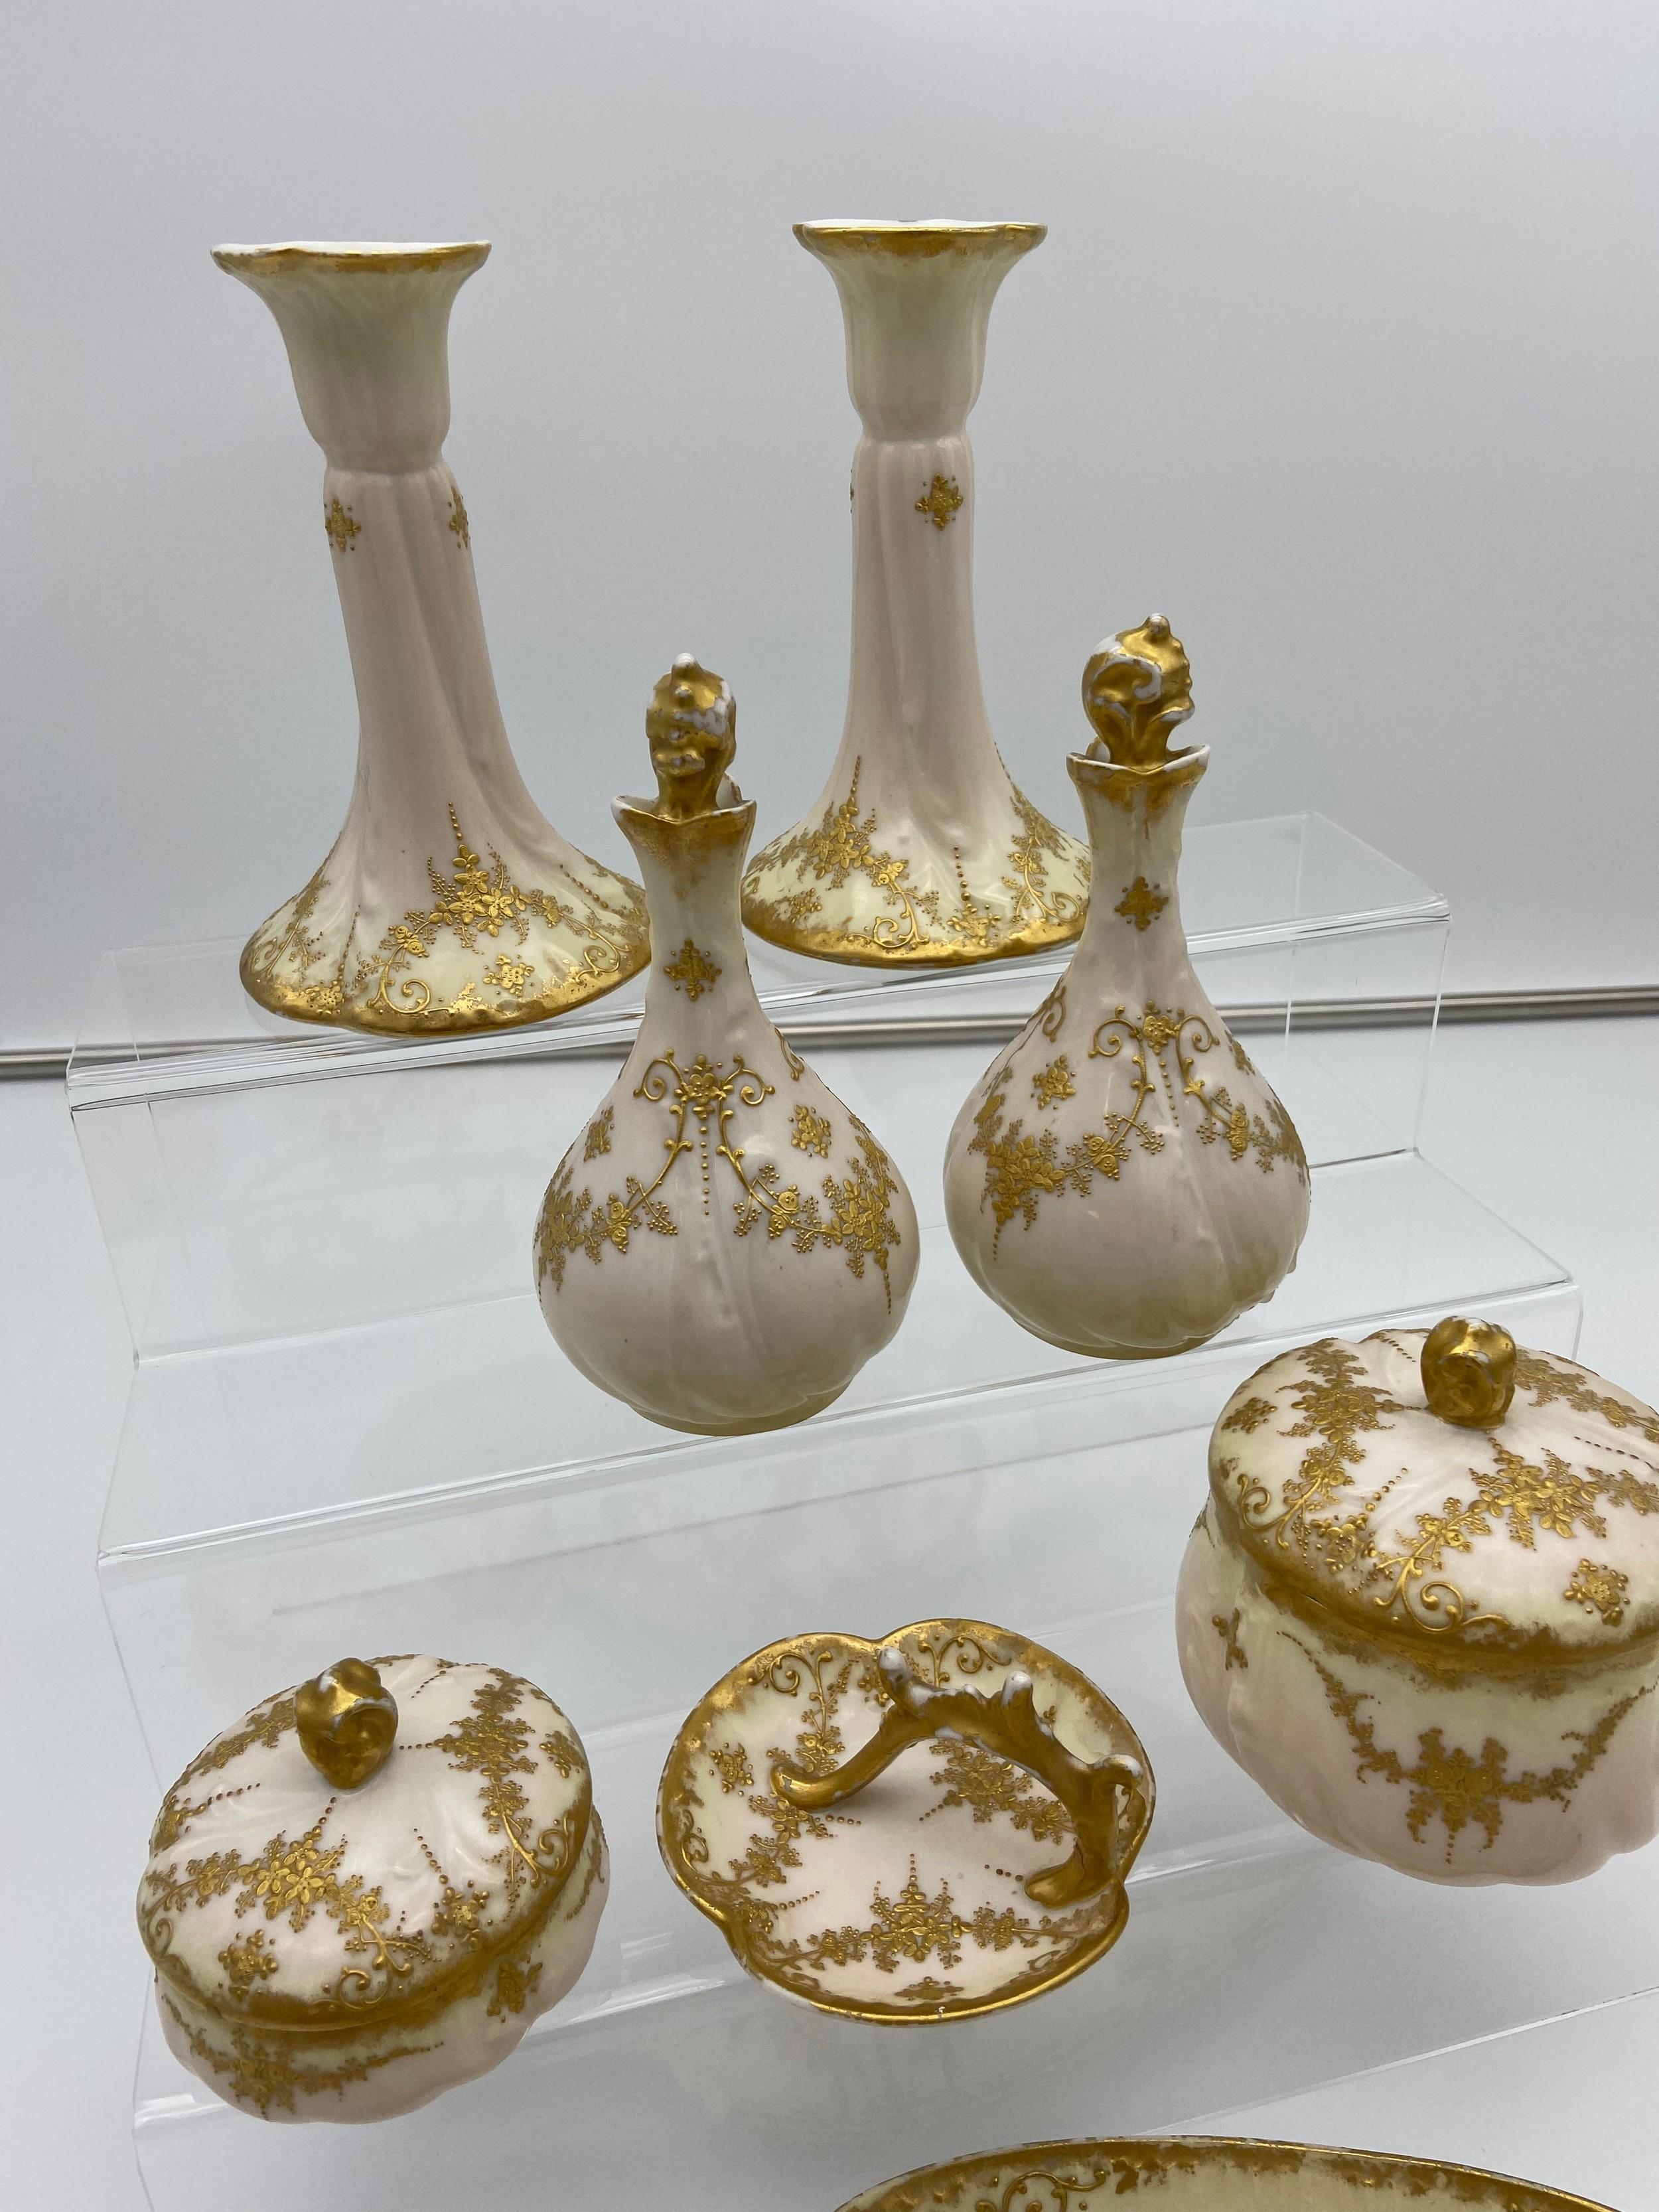 A Vintage French M Redon Limoges porcelain dressing table set. - Image 3 of 4